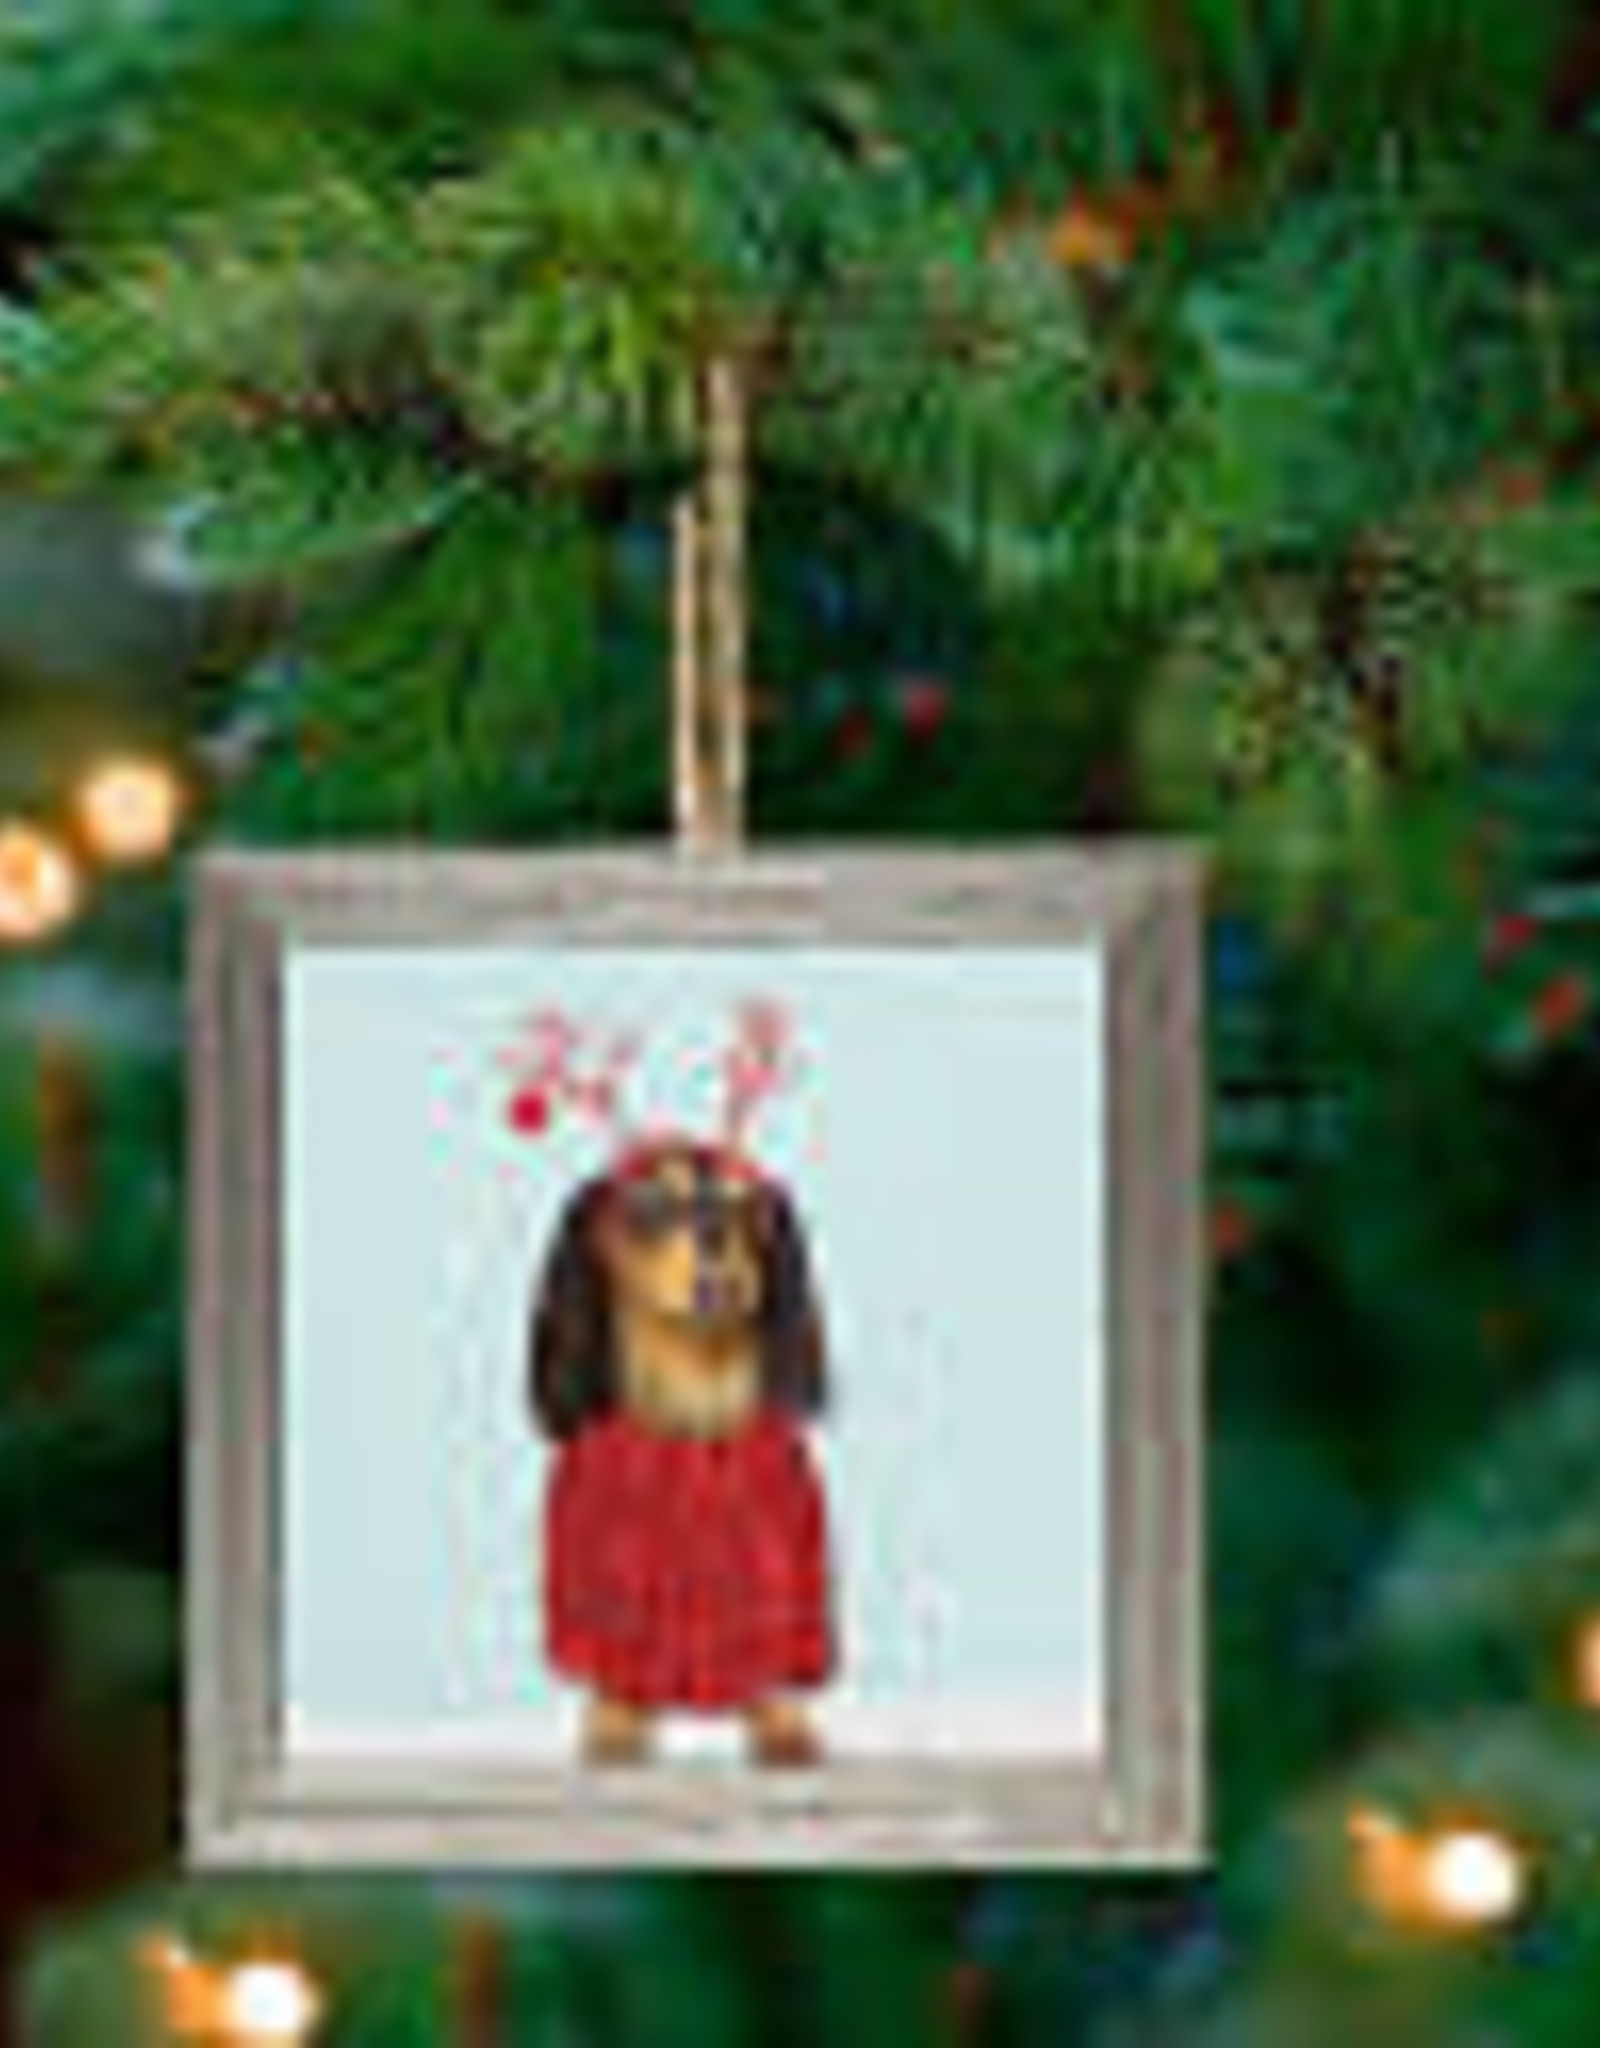 Greenbox Art Holiday - Festive Doxie Embellish Framed Wooden Ornament